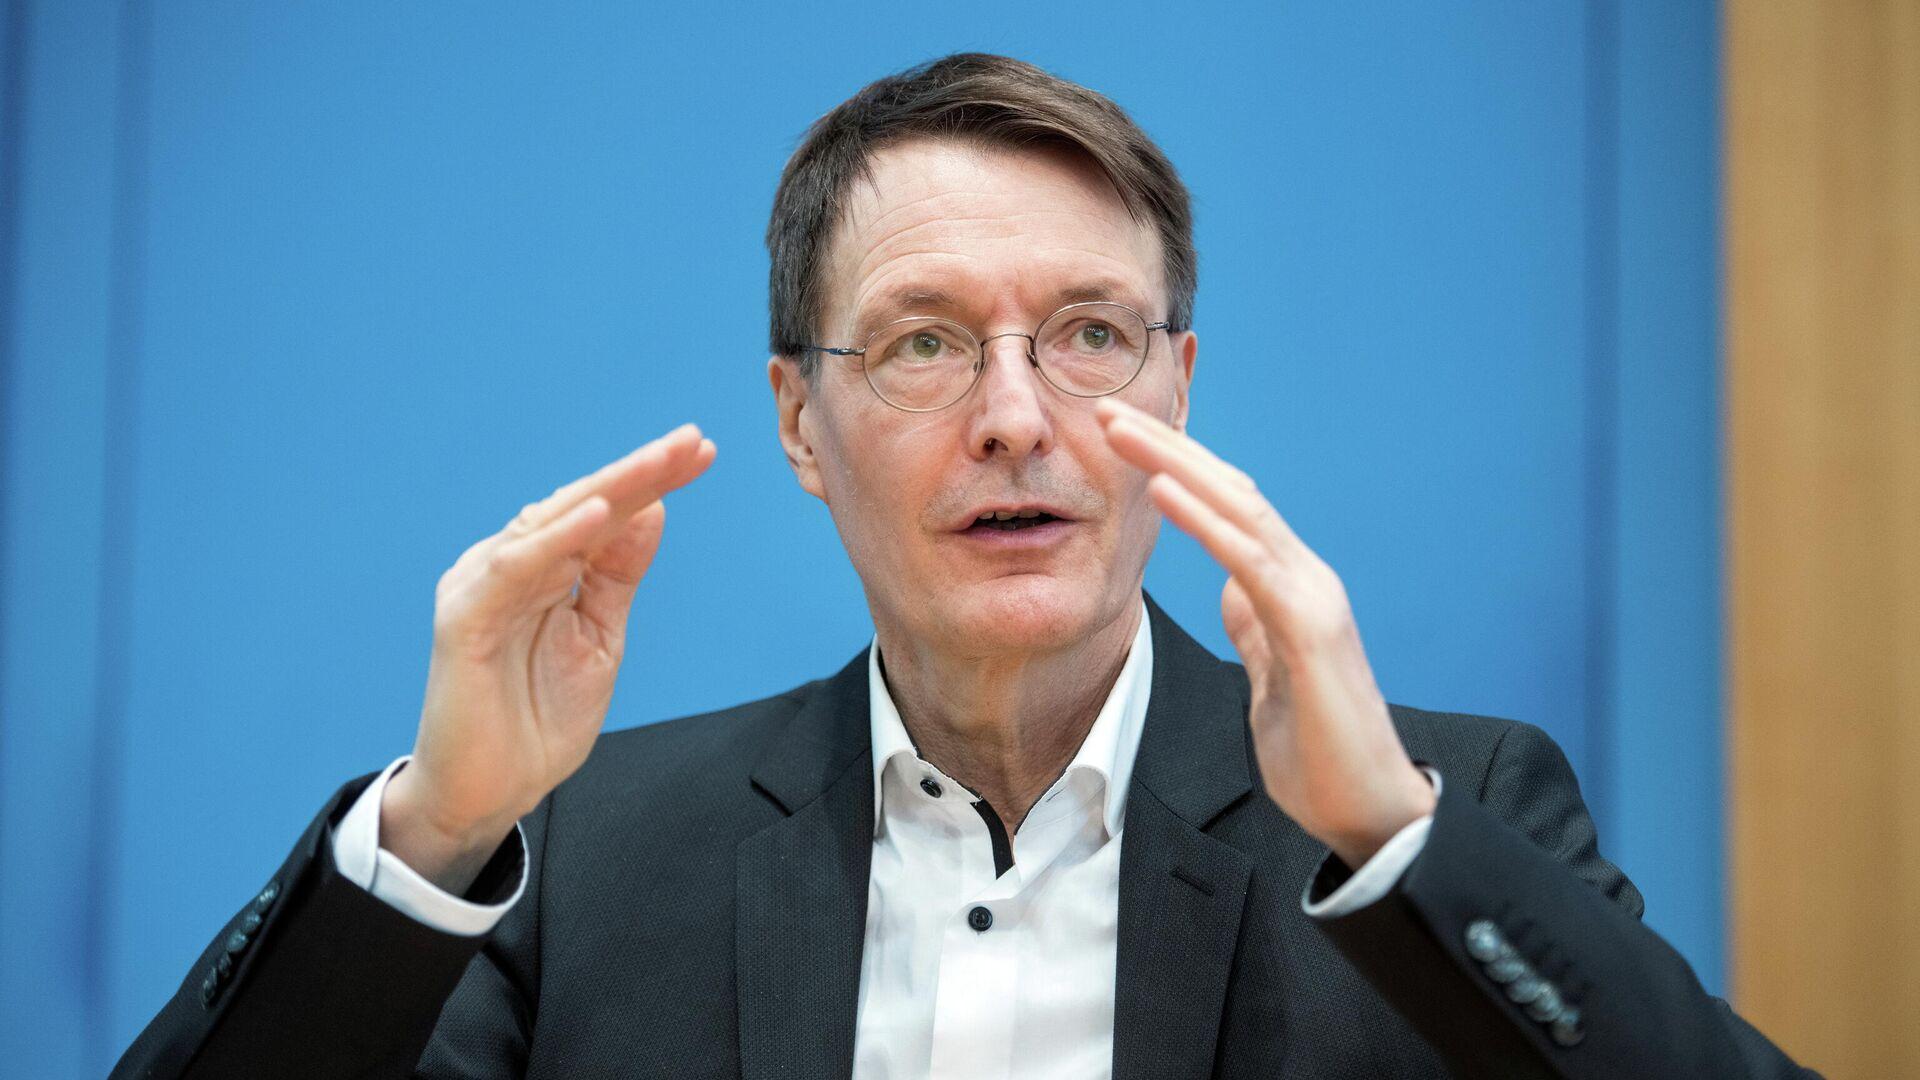 SPD-Politiker Karl Lauterbach - SNA, 1920, 15.04.2021